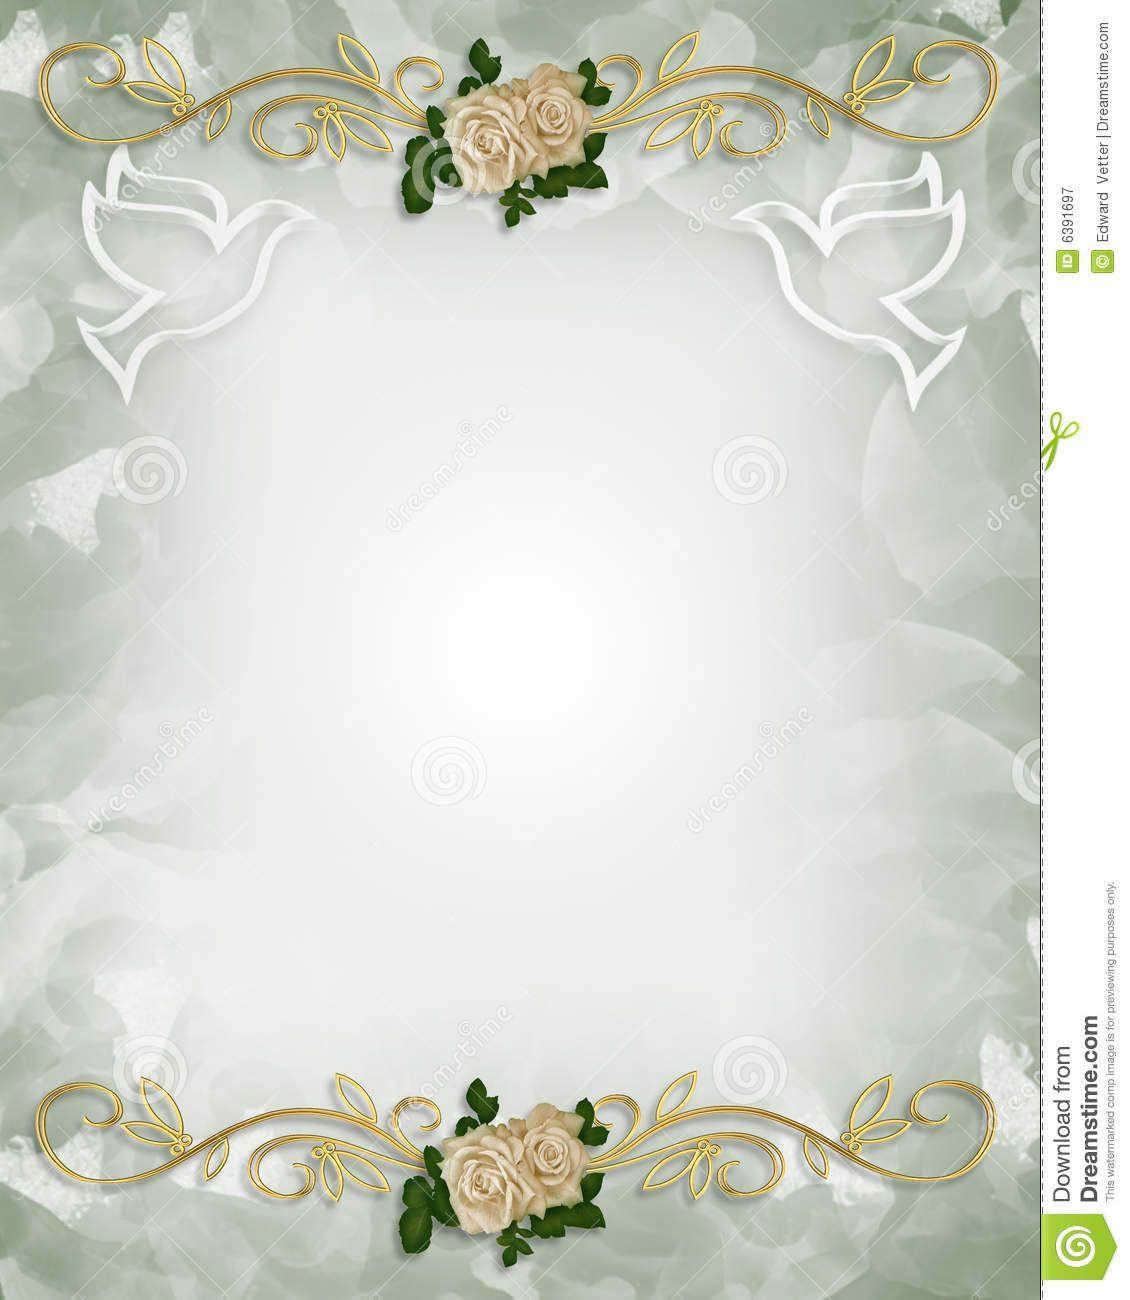 Hindu Wedding Invitation Blank Templates